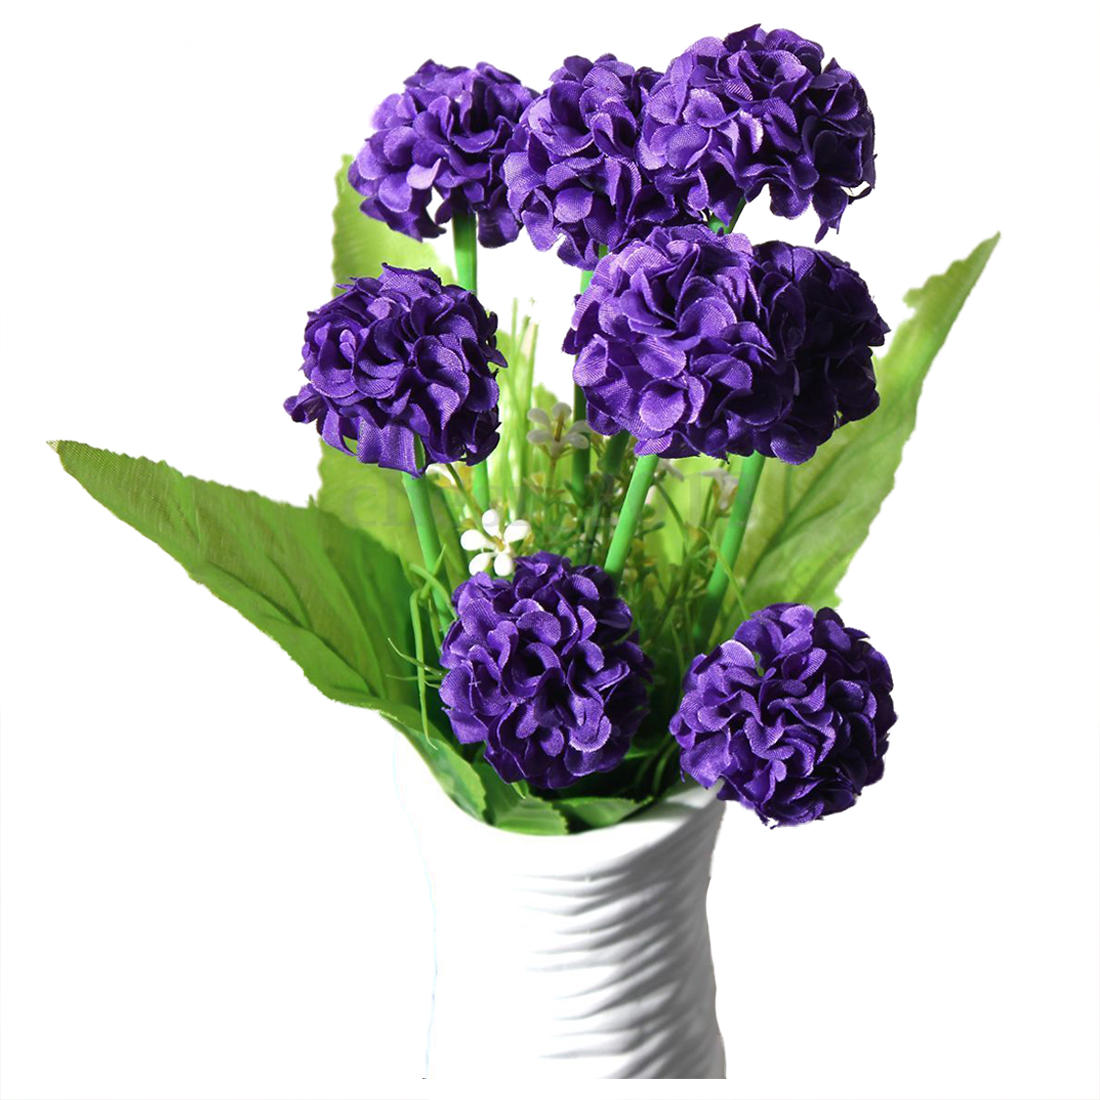 9 Heads 1 Bouquet Artificial Chrysanthemum Silk Flowers Floral Home